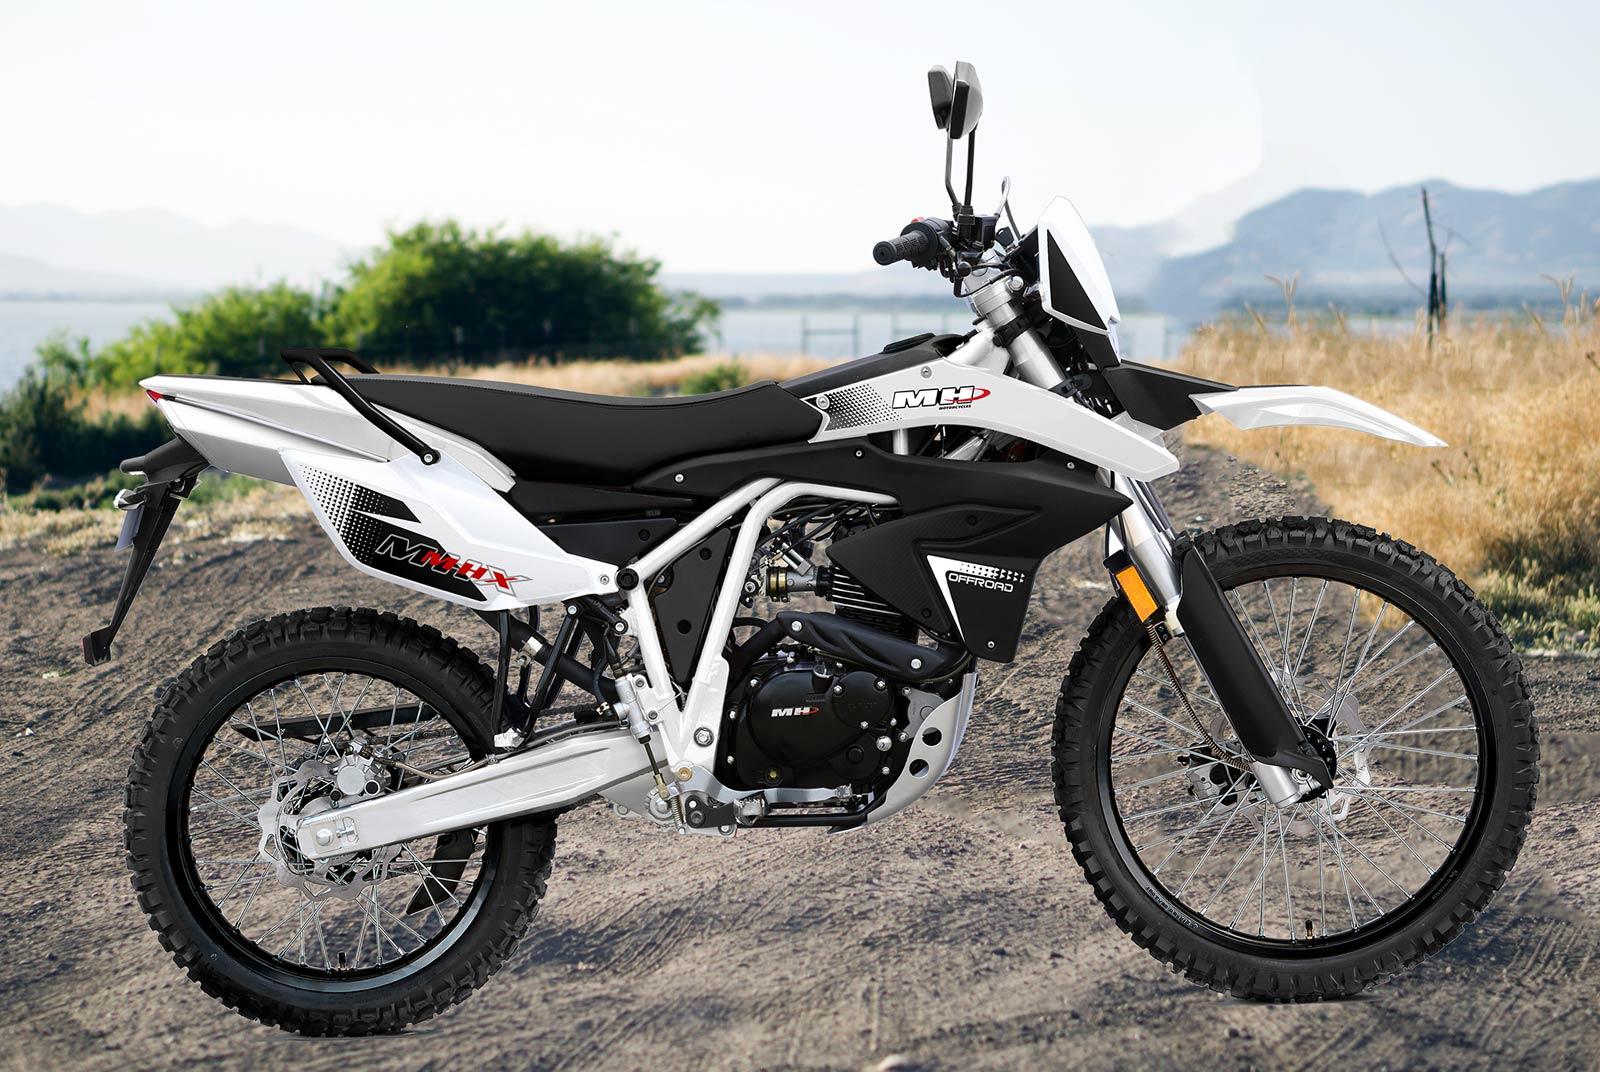 01-mh-motorcycles-mhx-125-2017-perfil (1)